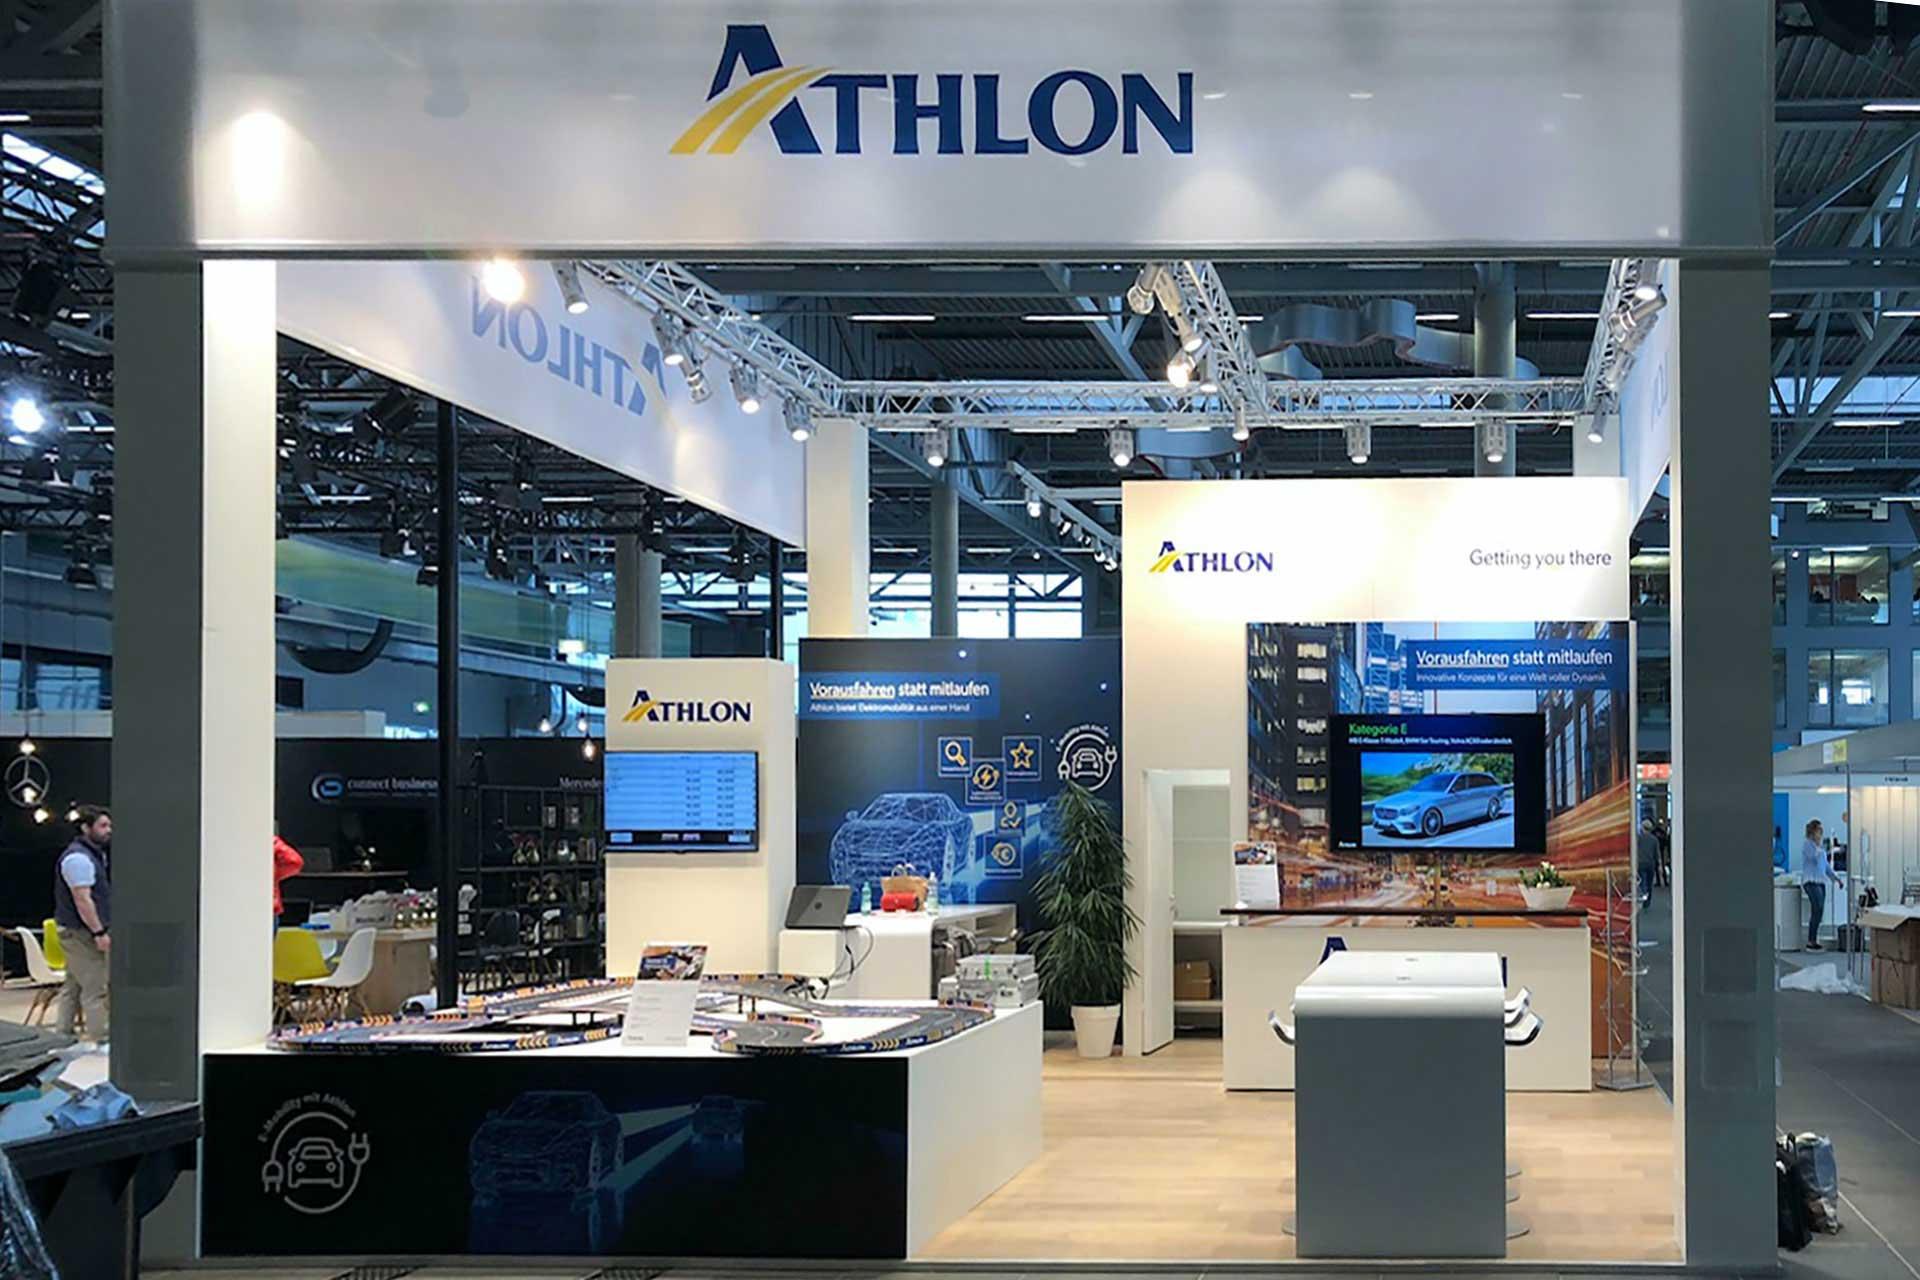 Athlon Messestand bfp-Fuhrparkforum